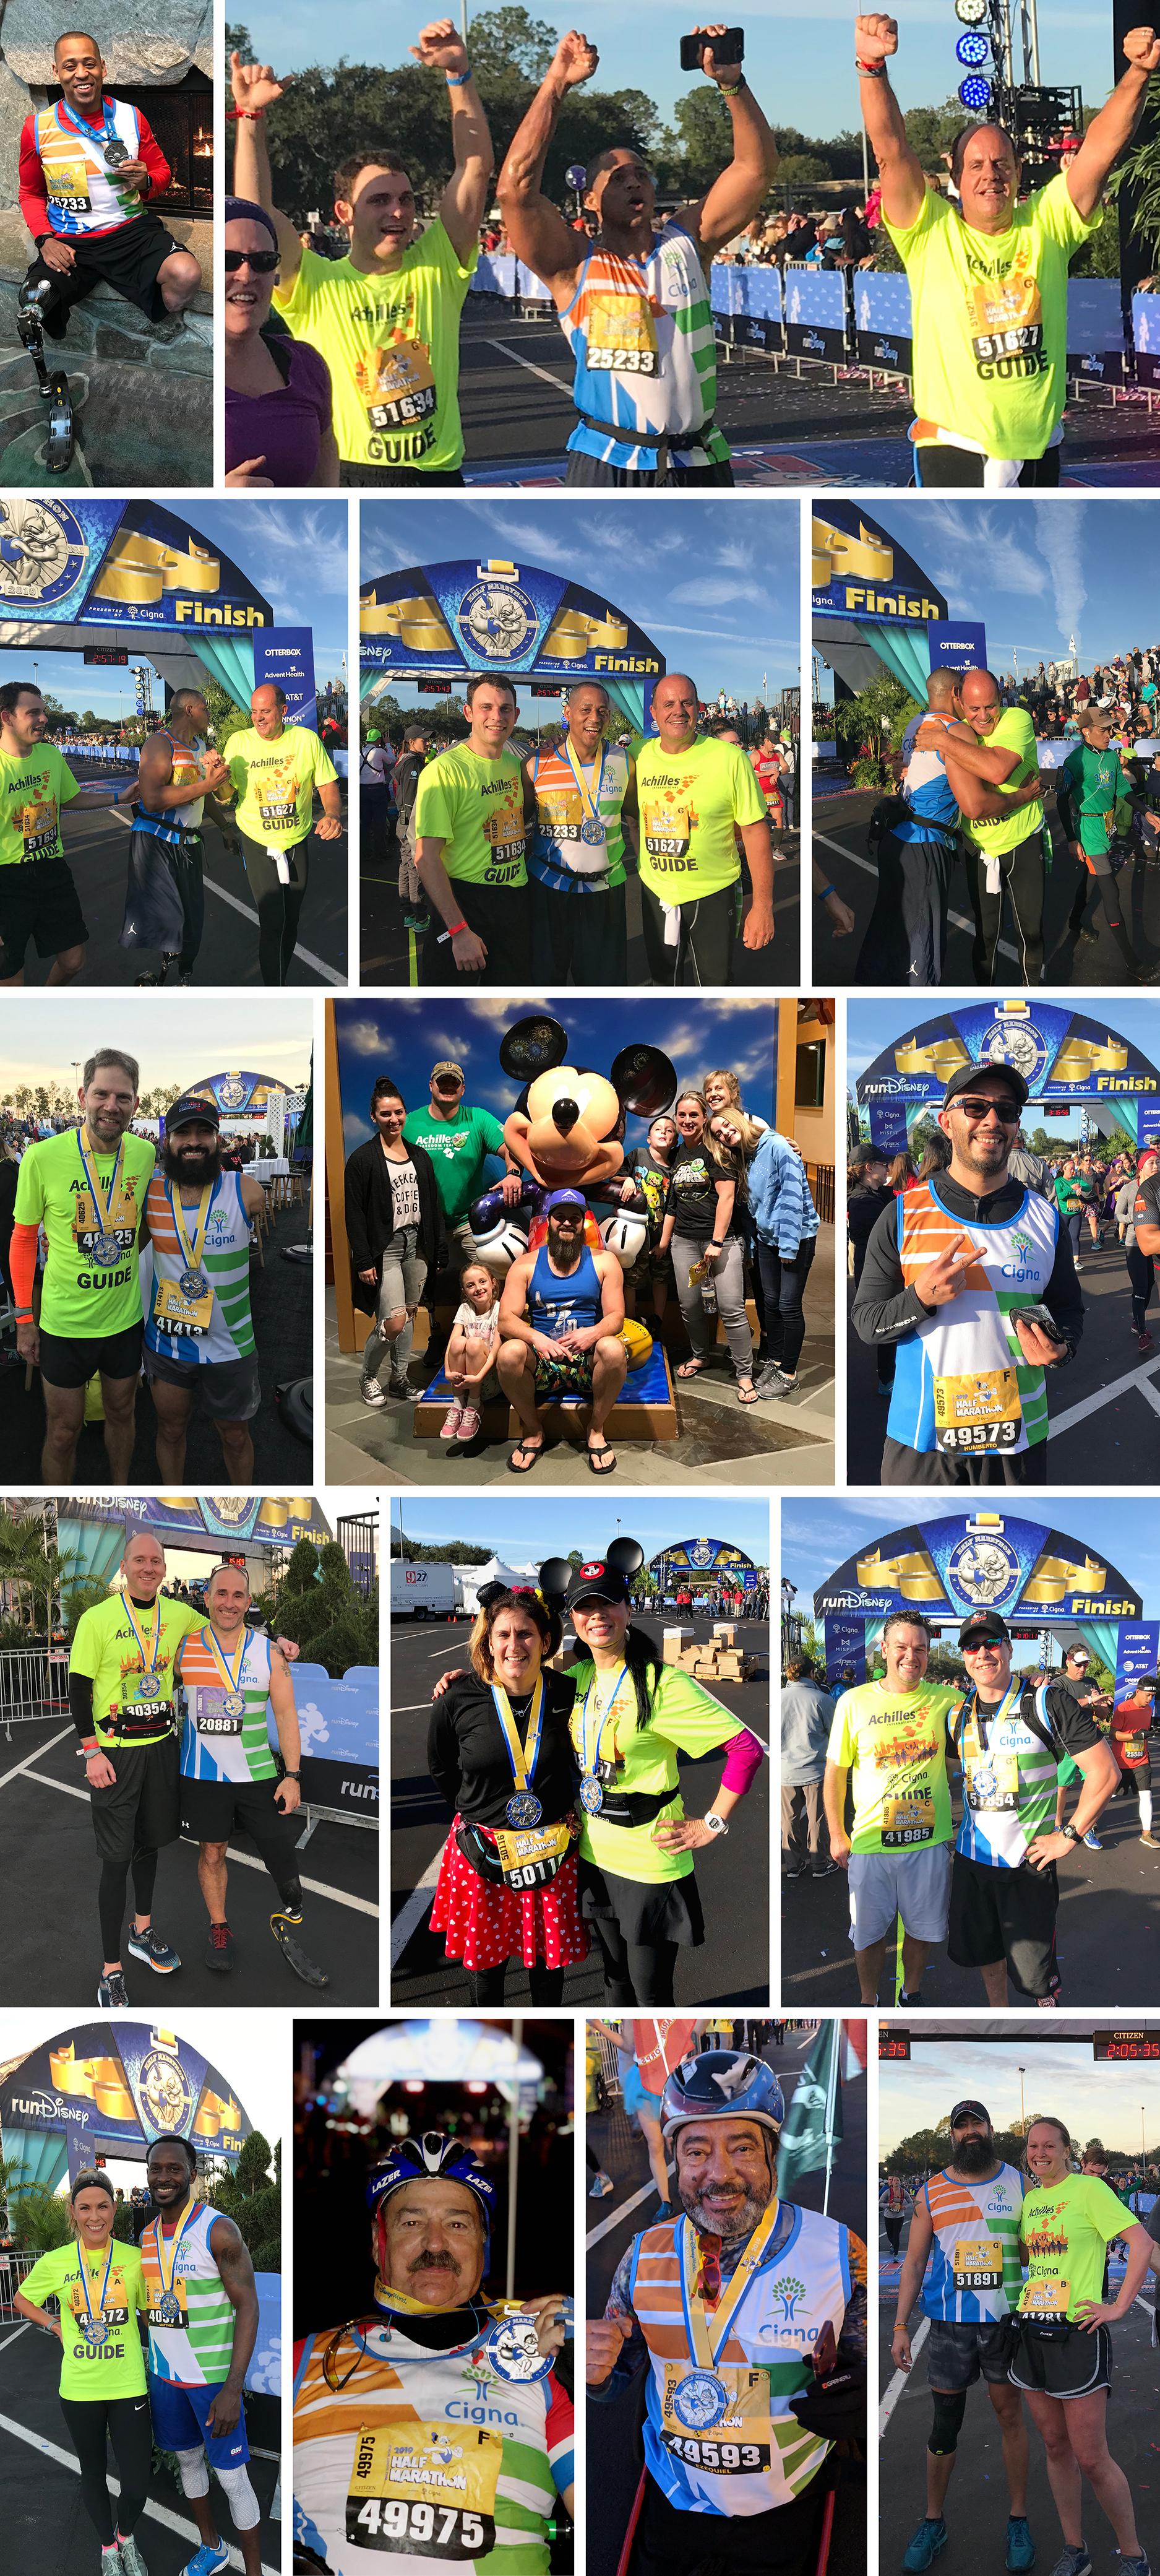 2019-02 Disney Marathon collage TWO REVISED 2 1500px.jpg